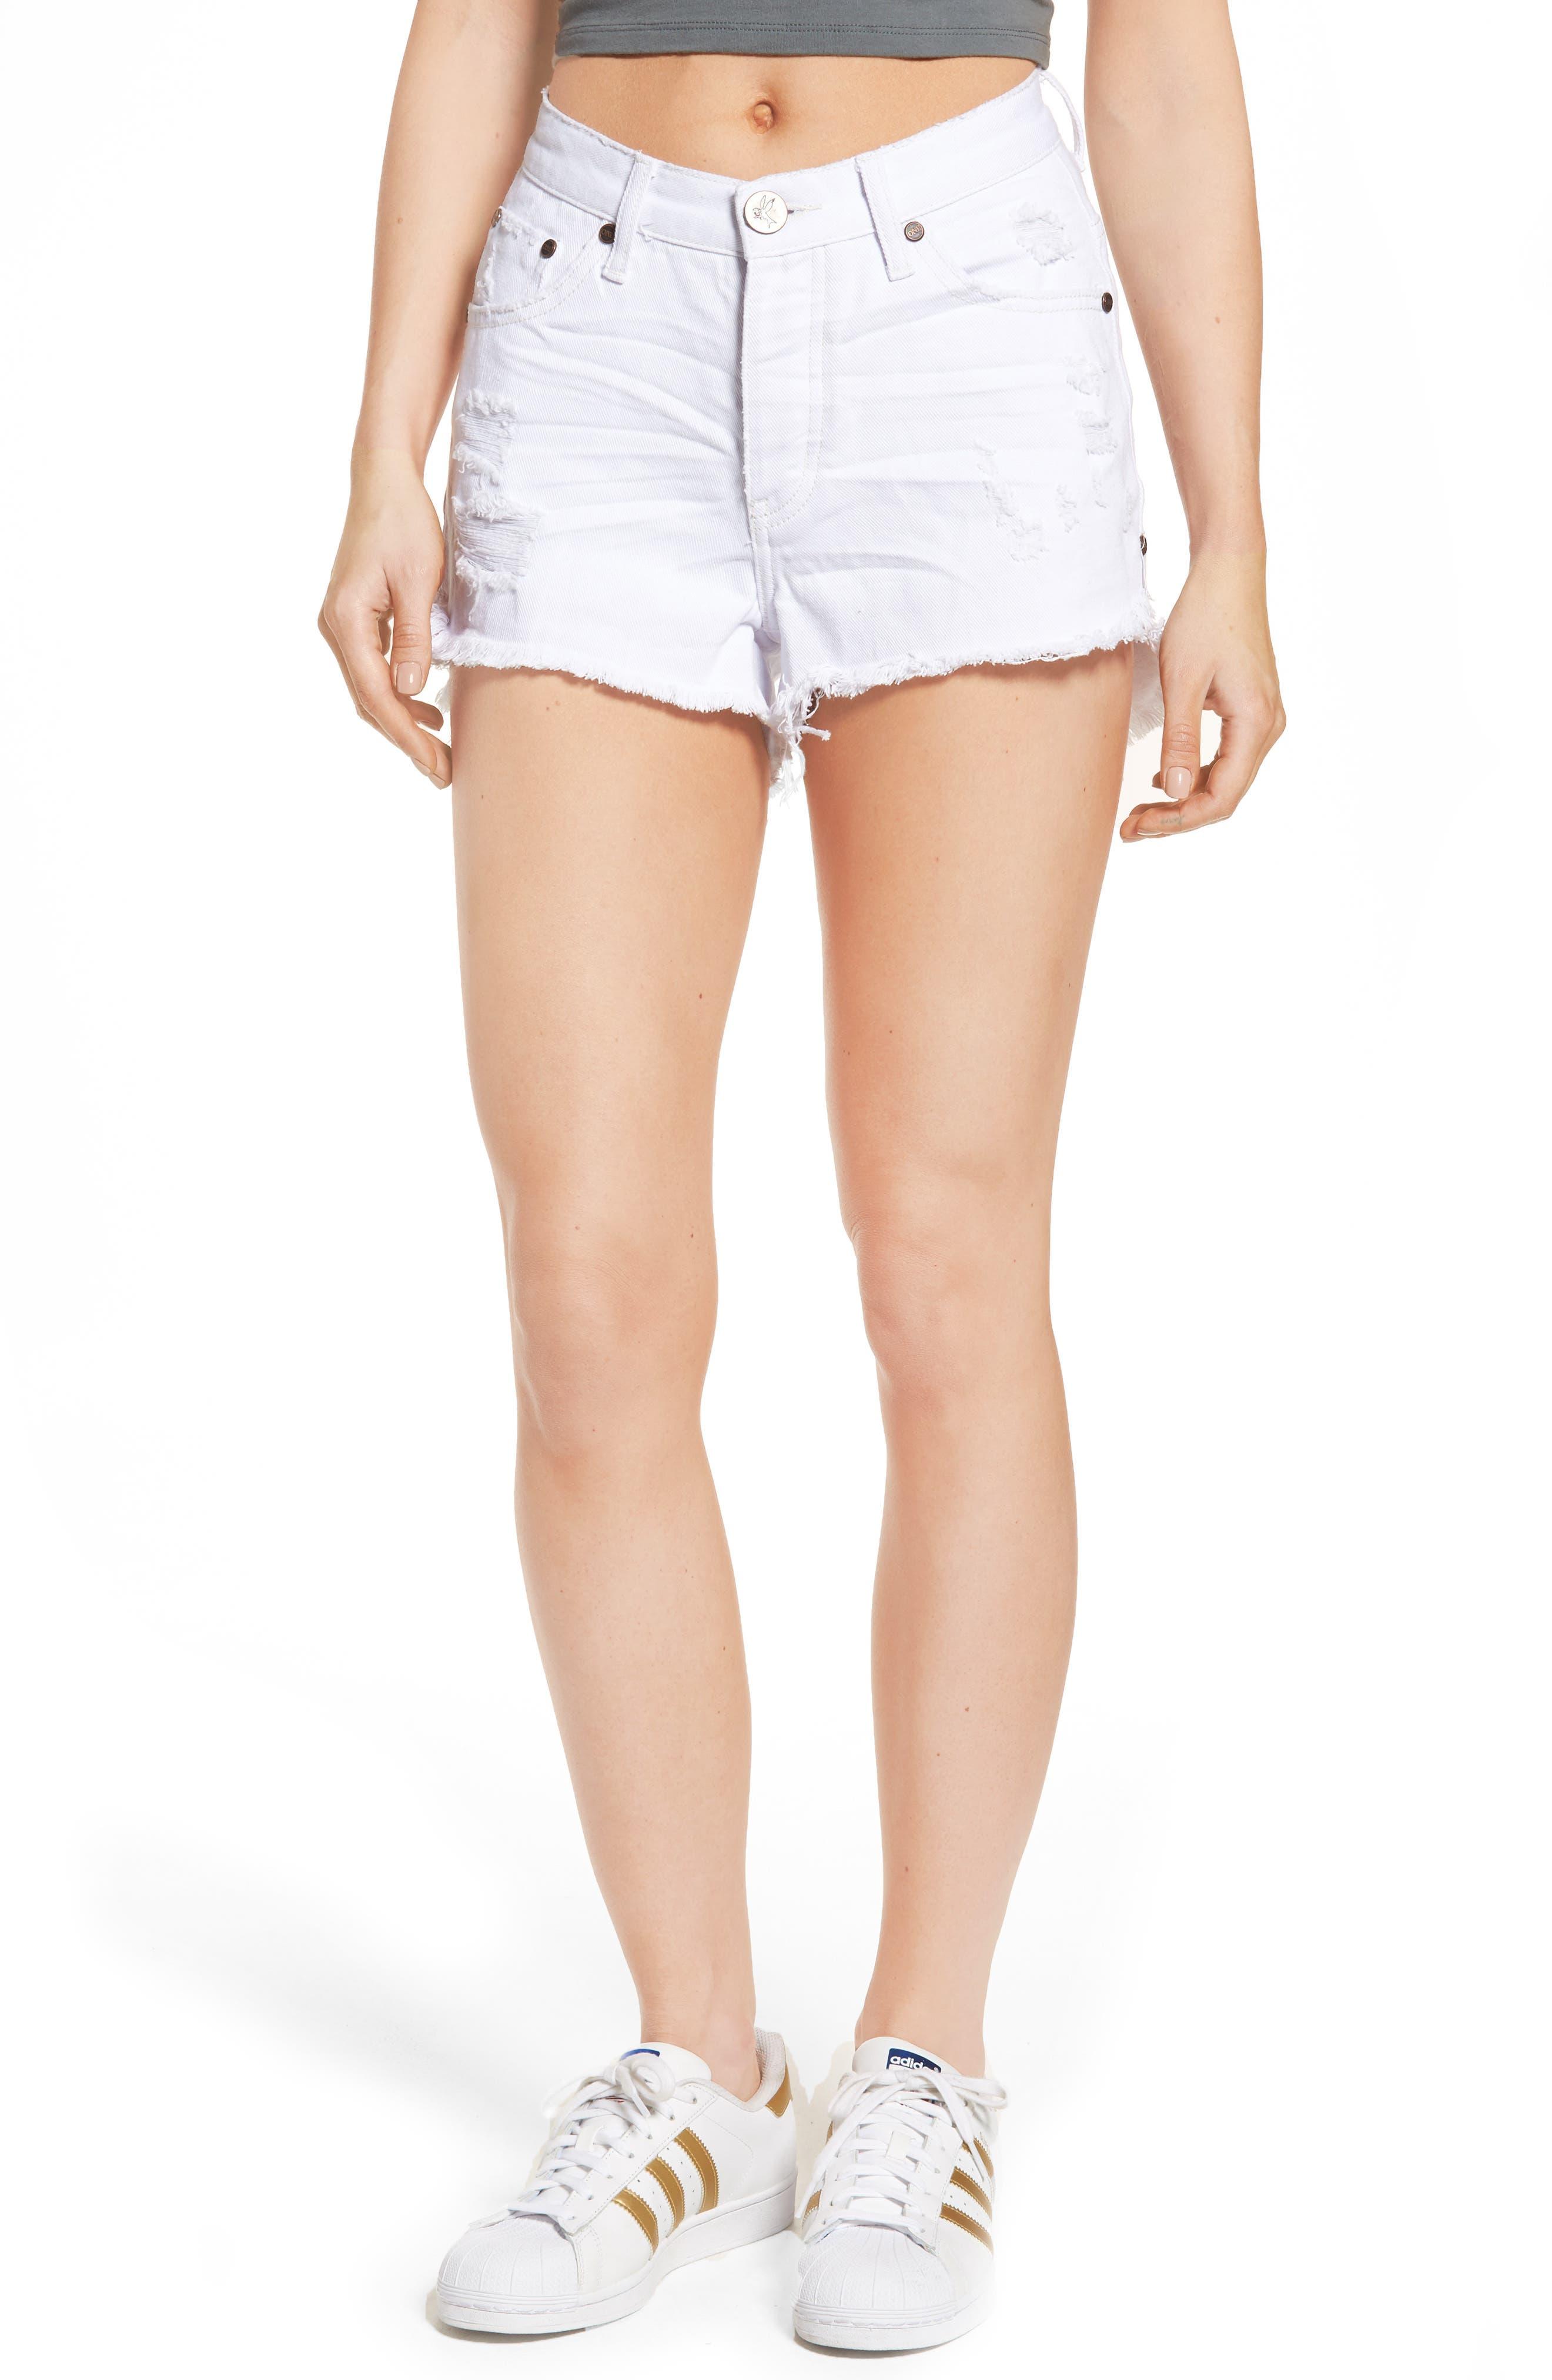 Alternate Image 1 Selected - One Teaspoon Bonita High Waist Denim Shorts